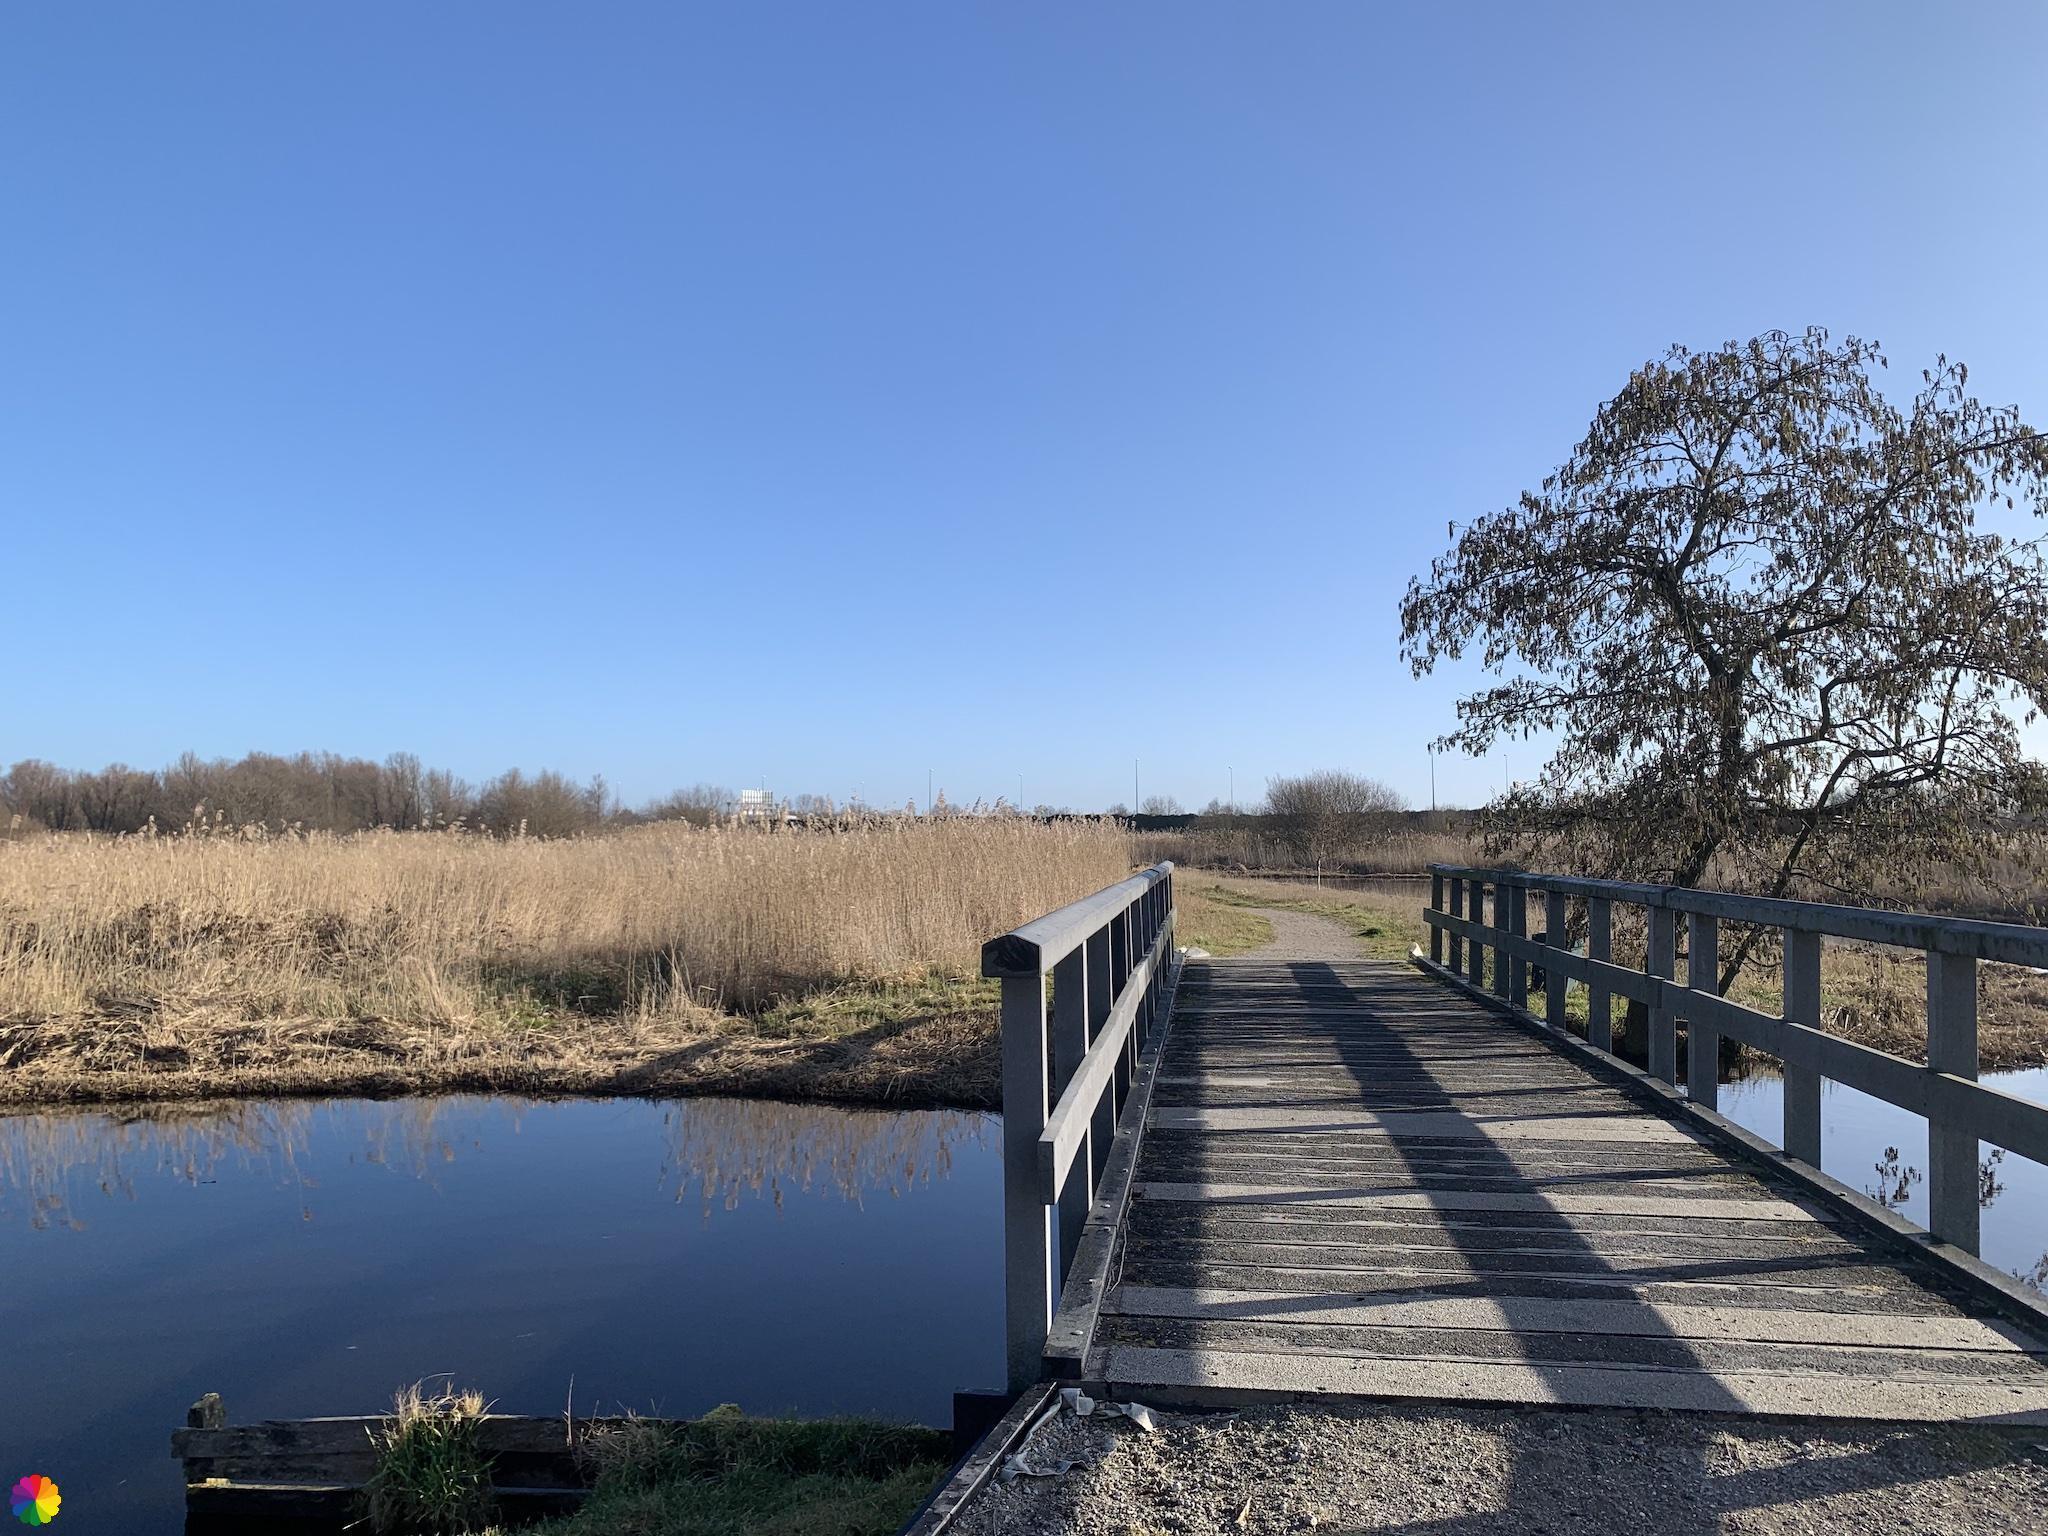 Bruggetje in Jagersveld